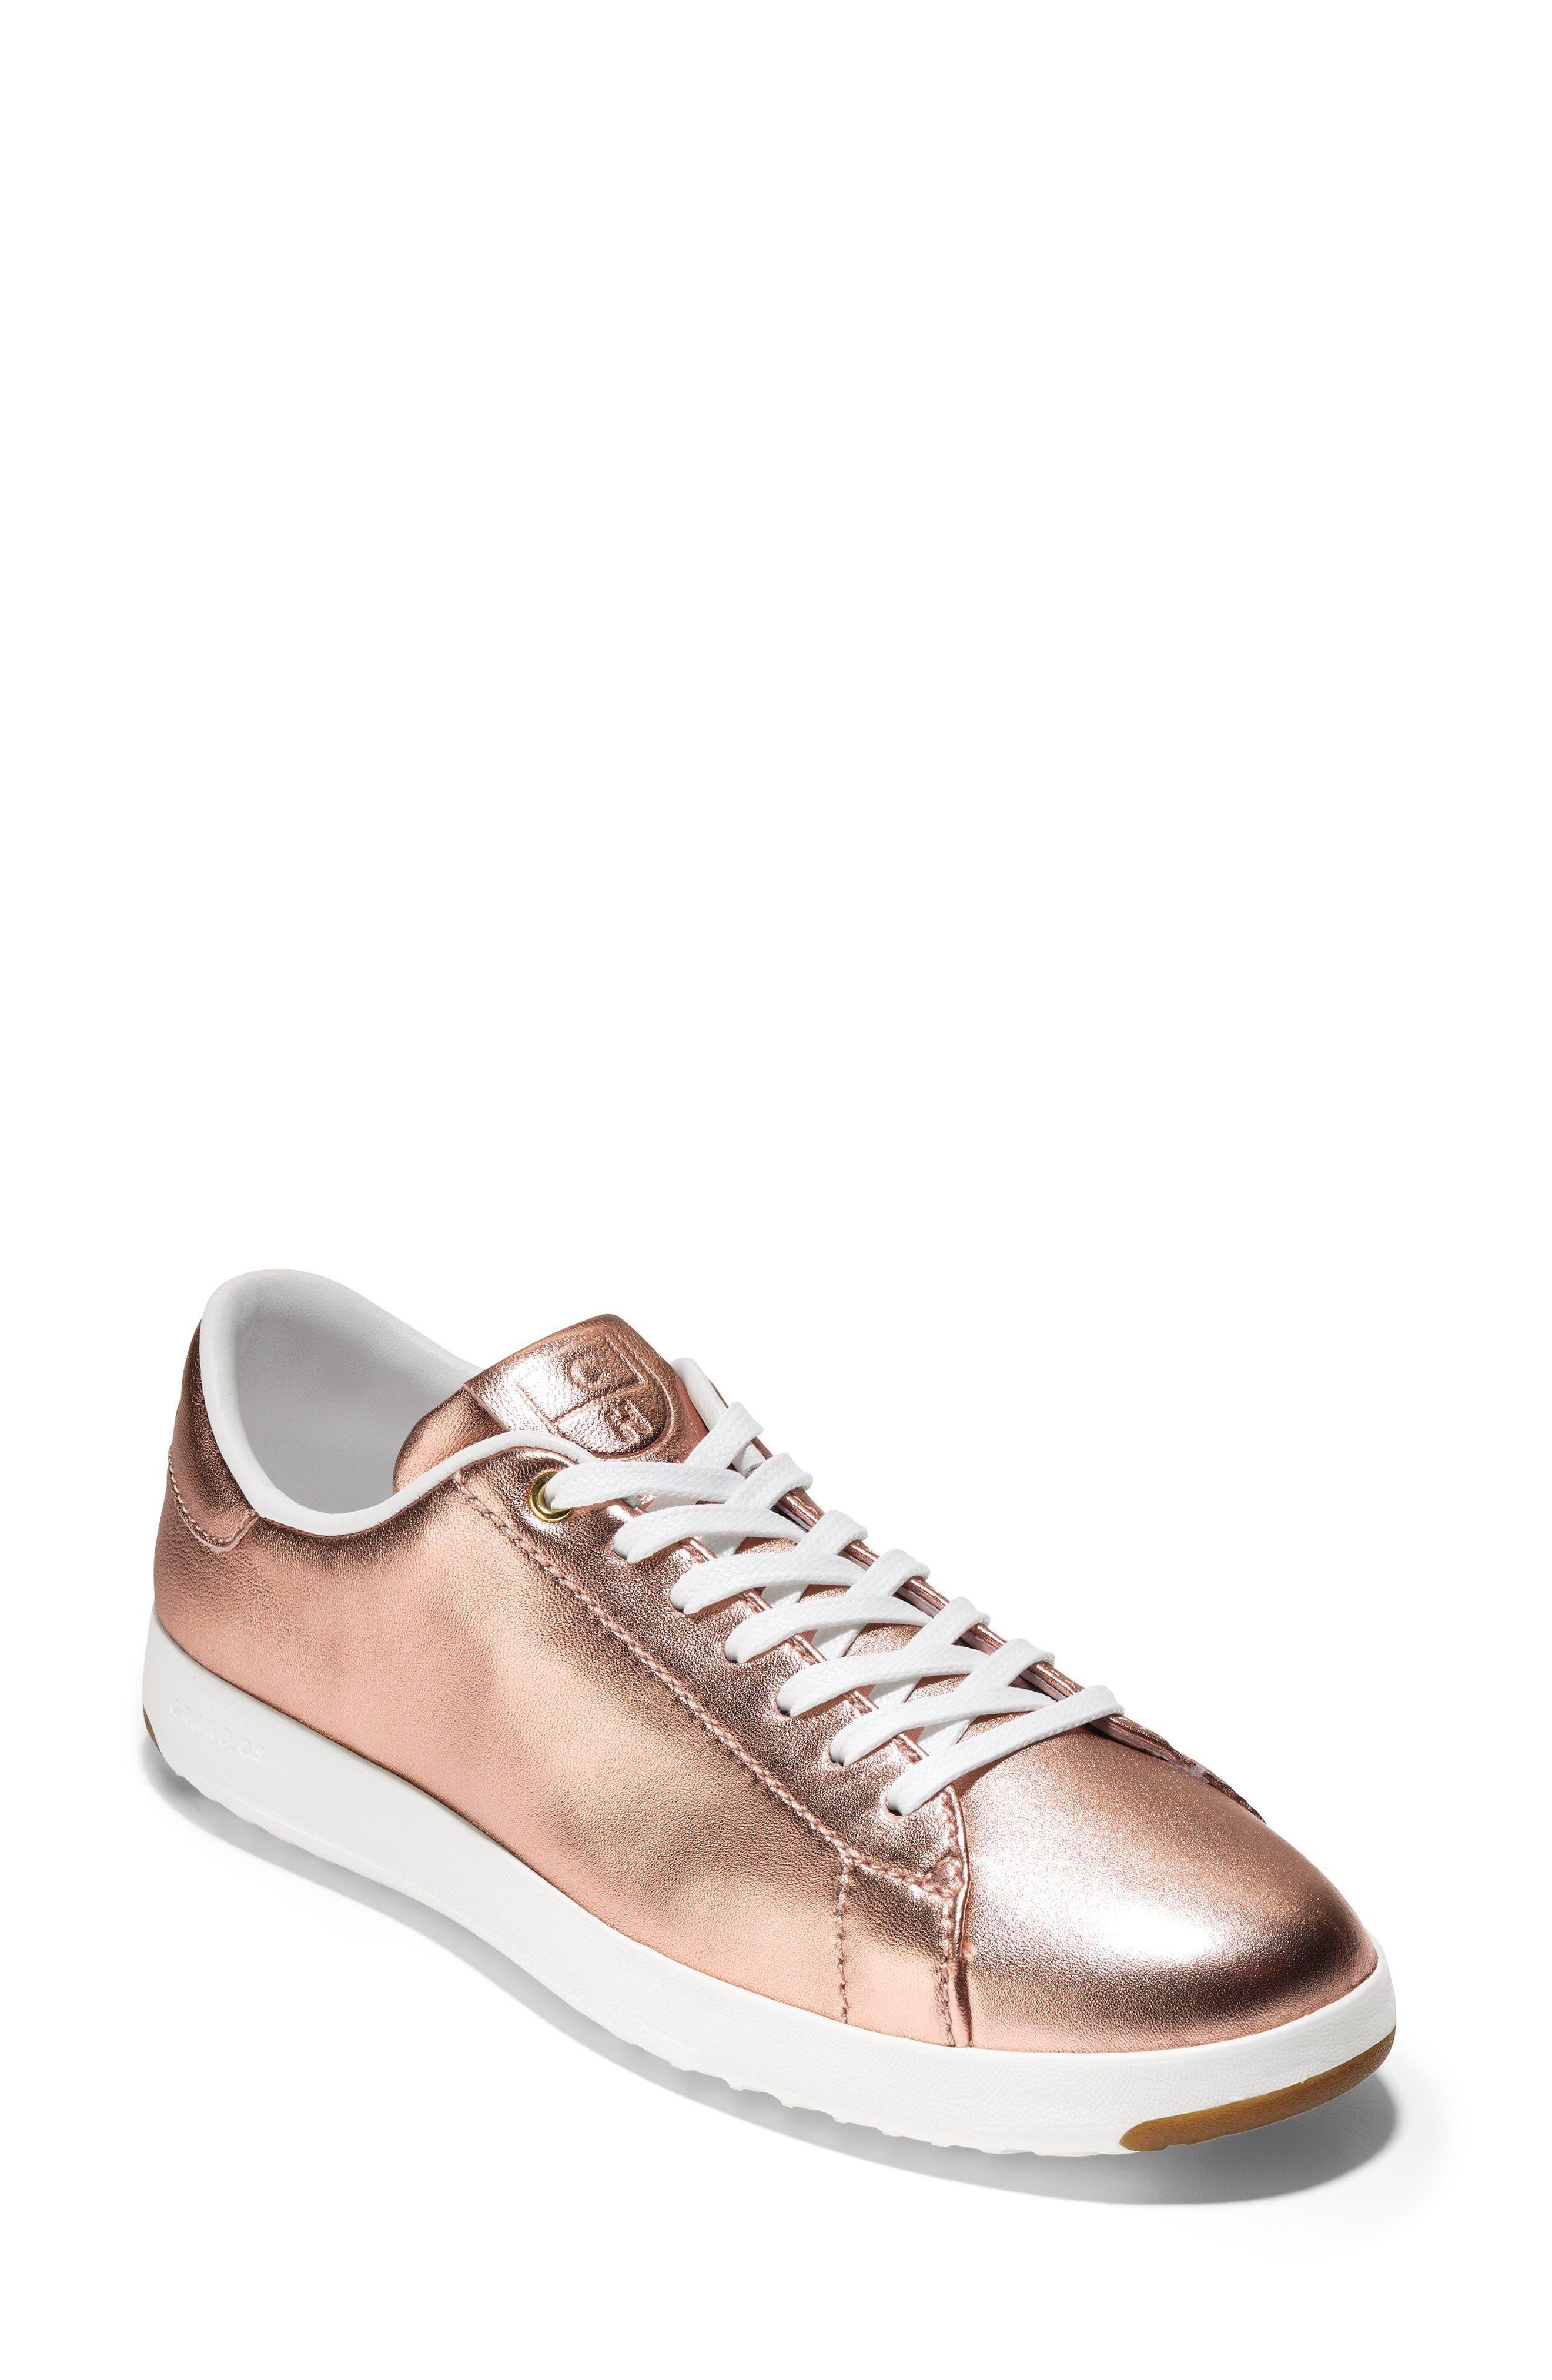 GrandPro Tennis Shoe,                             Main thumbnail 1, color,                             Rose Gold Leather